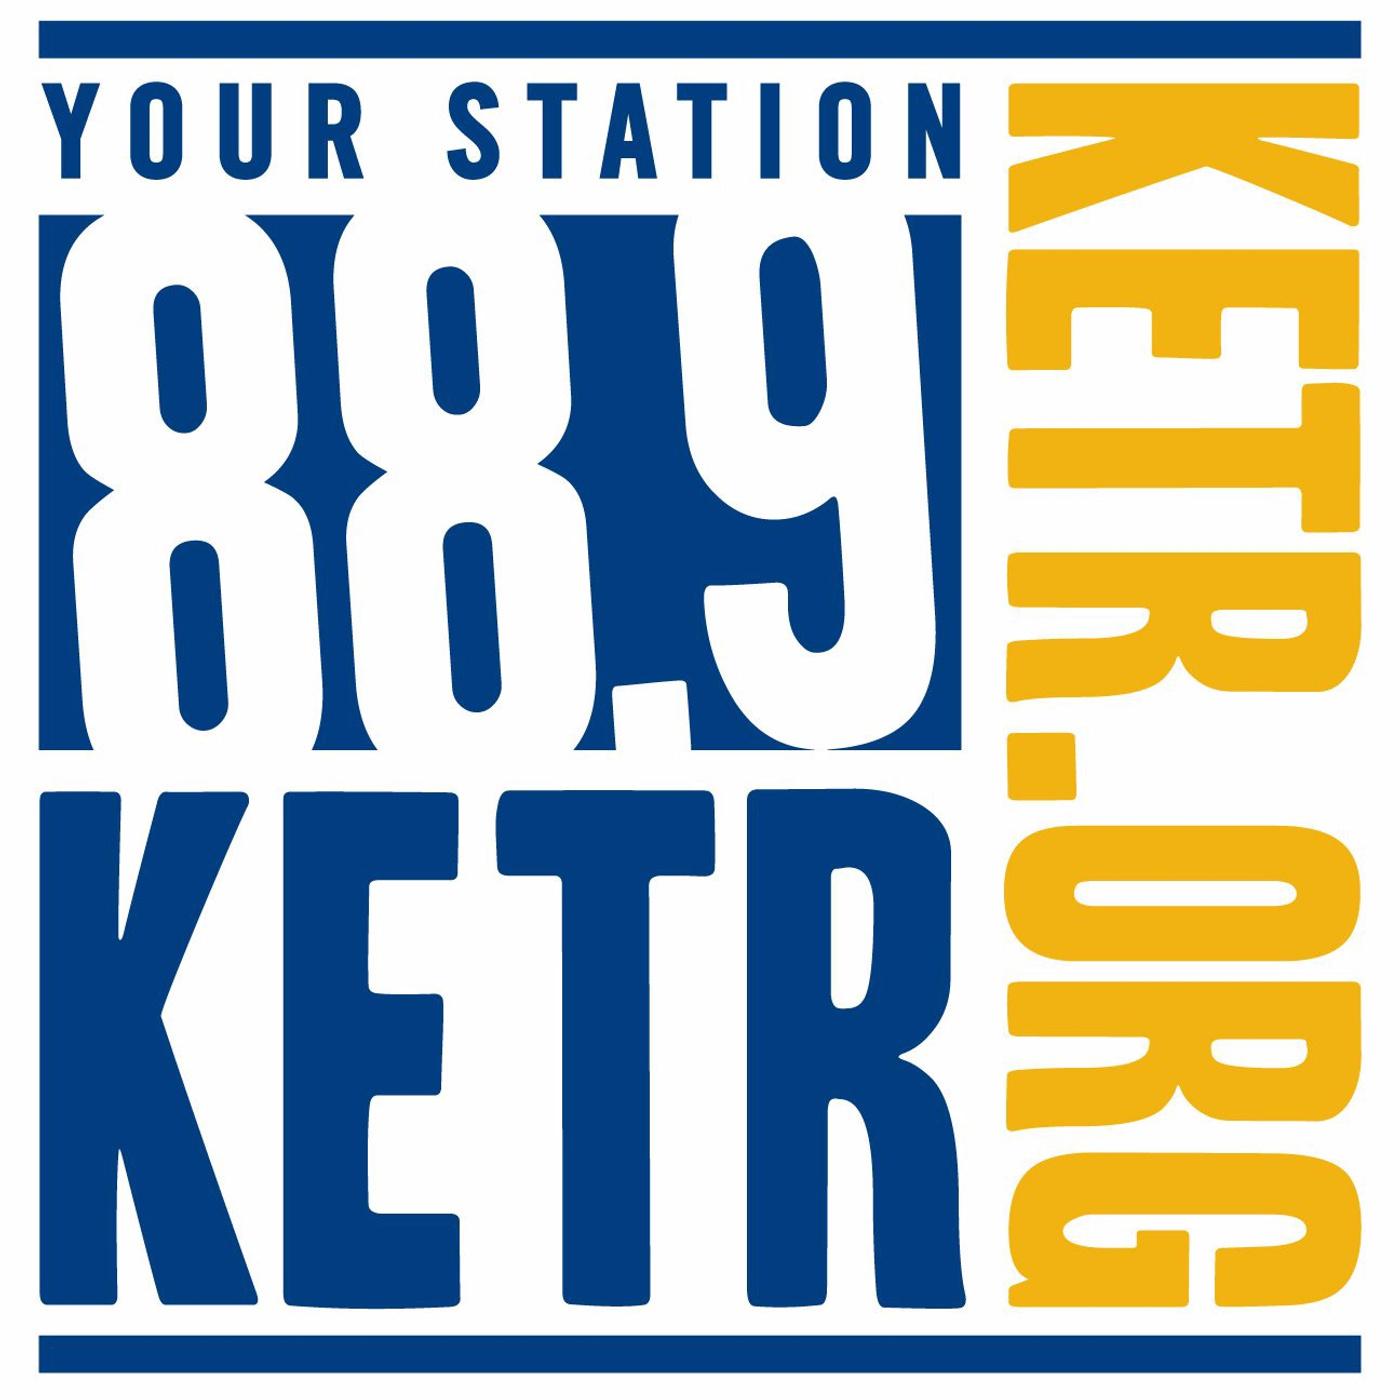 Buried Radio: KETR News Spot 01 - Oct. 11, 2018